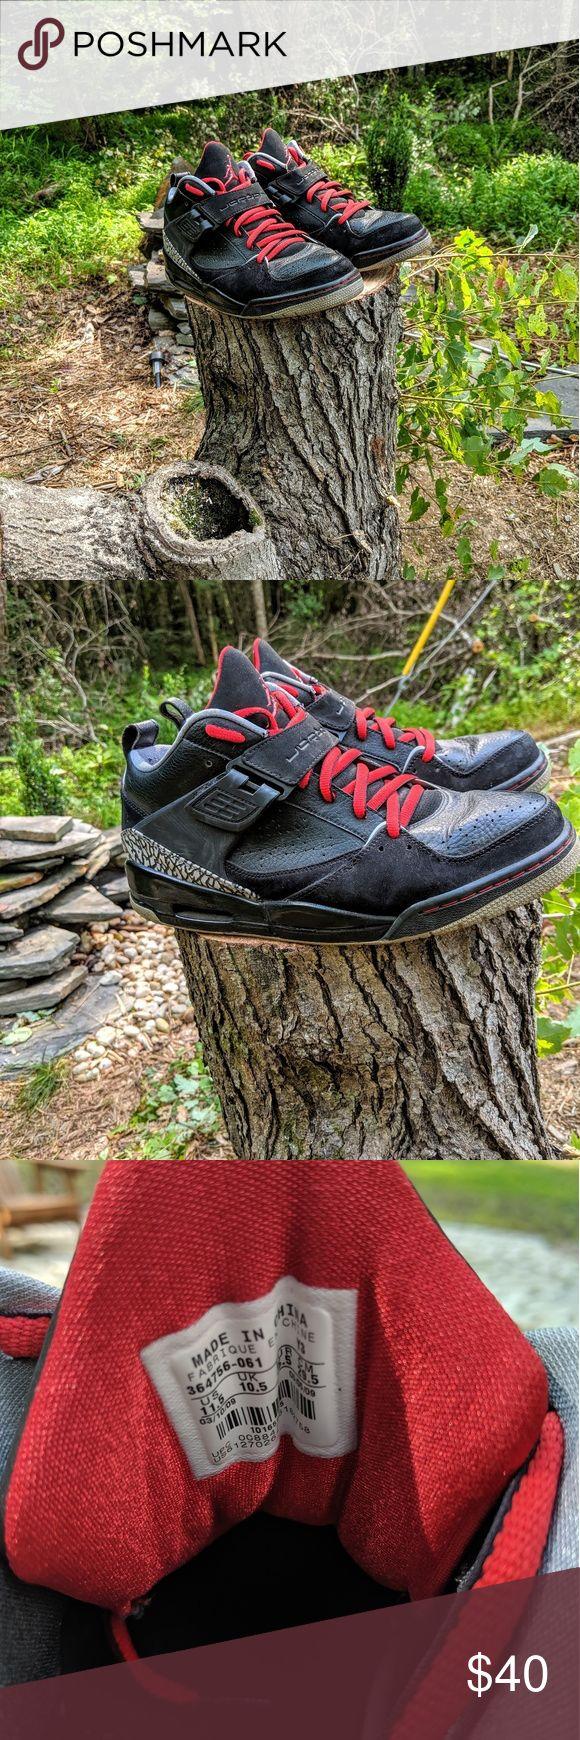 Jordan Schuhe | Jordans | Farbe: Schwarz / Rot | Größe: 11,5 – My Posh Picks